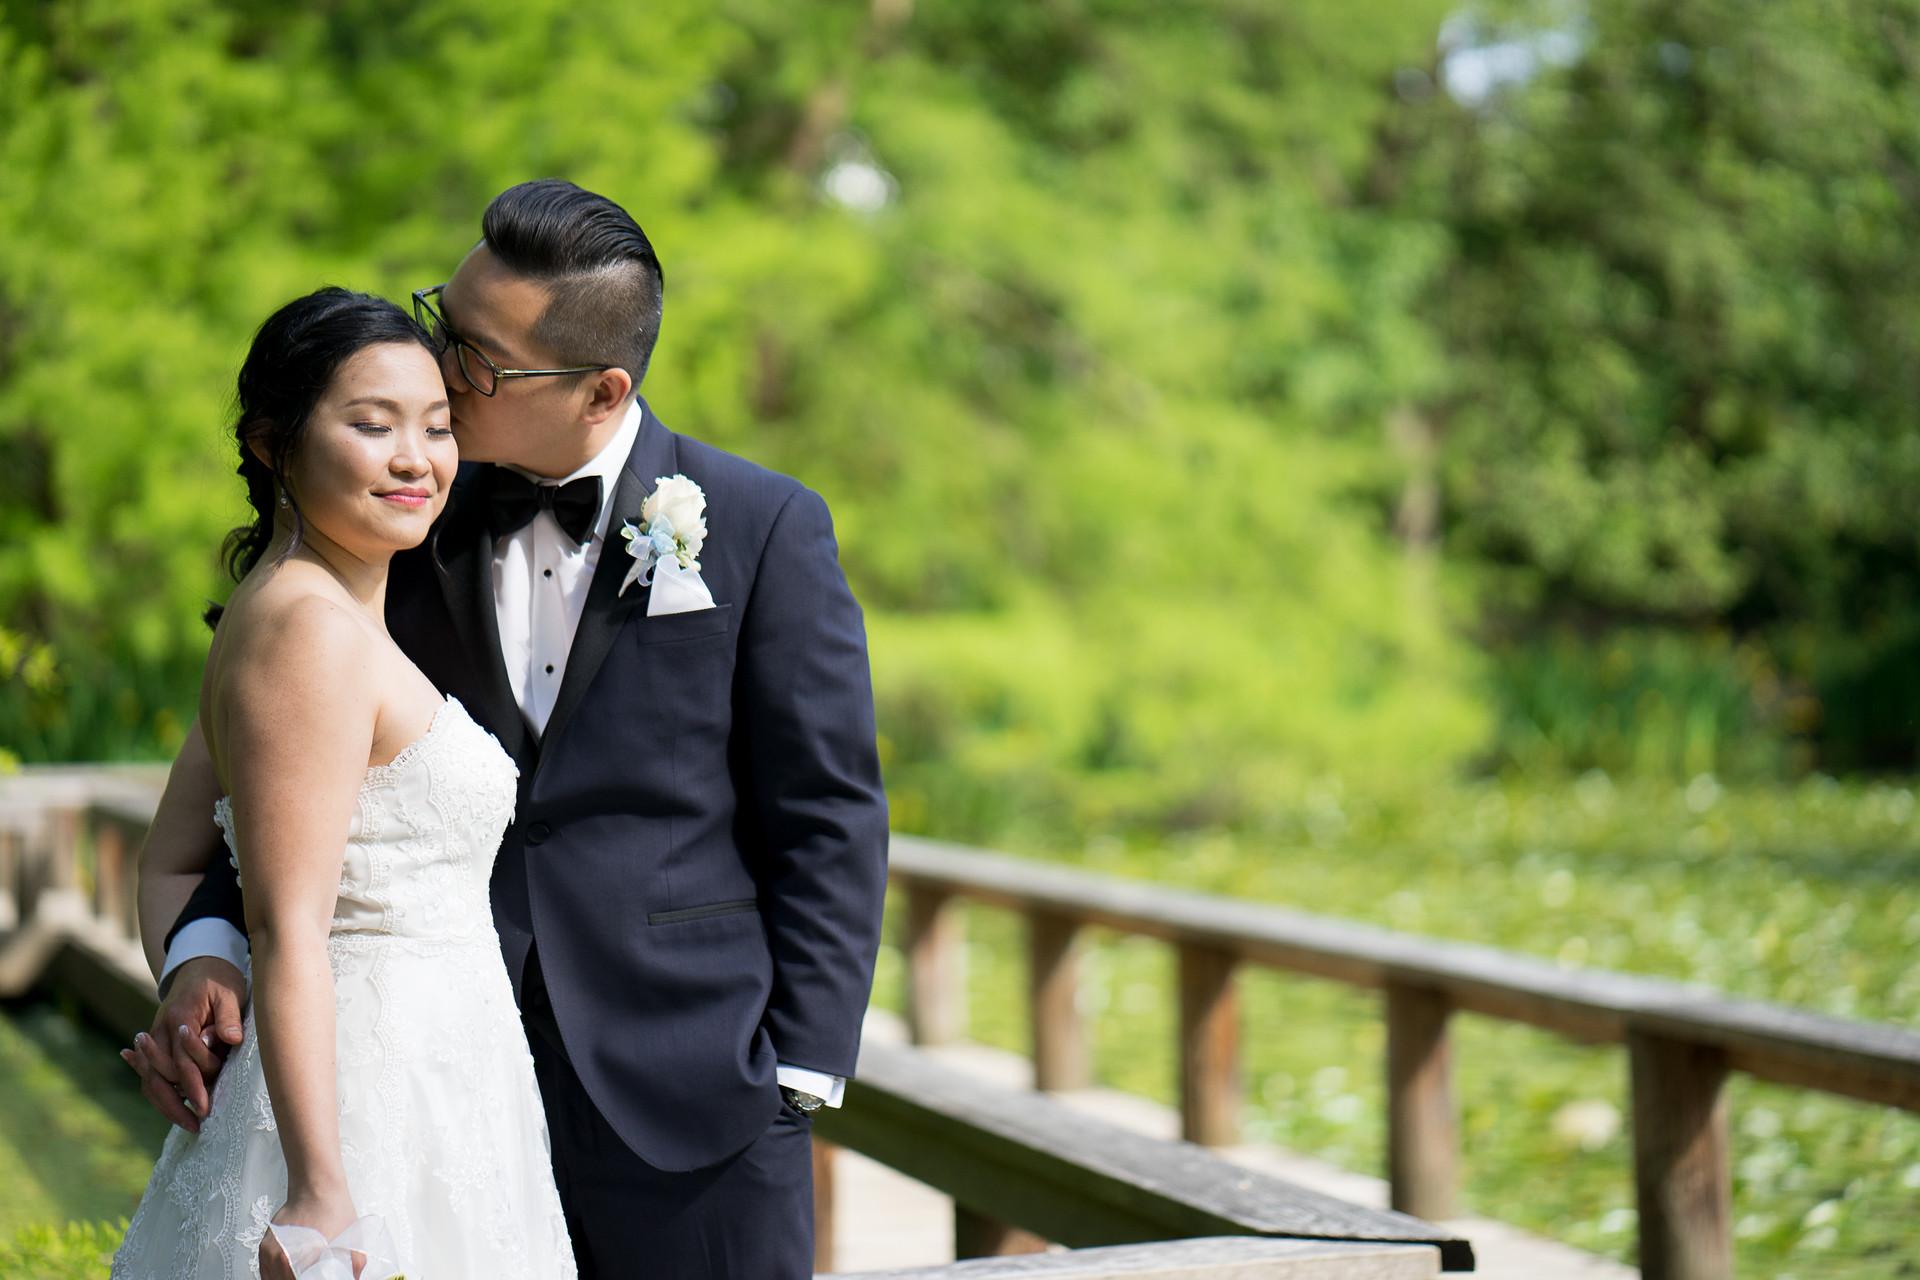 wenthony-wedding-487.jpg